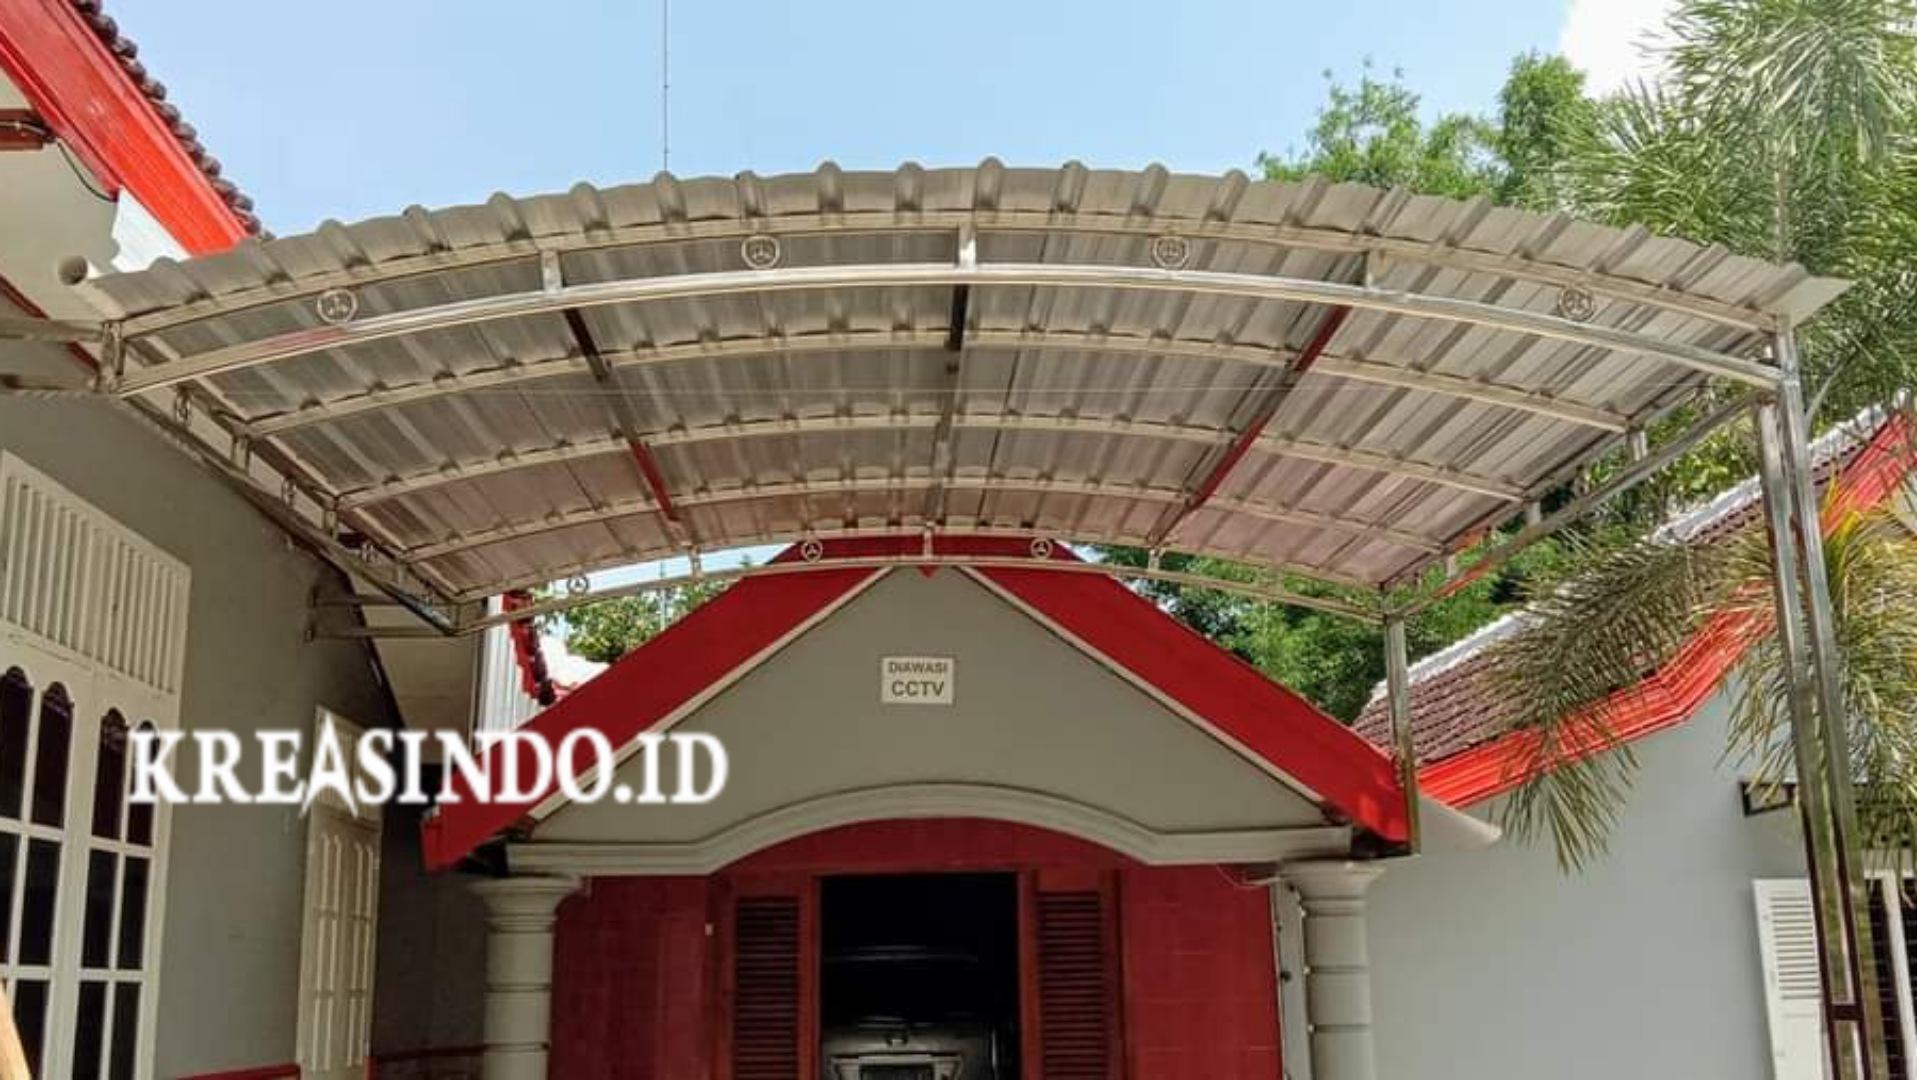 Mau Buat Canopy? Ini Dia Jasa Kanopi Stainless Atap Spandek Terbaik